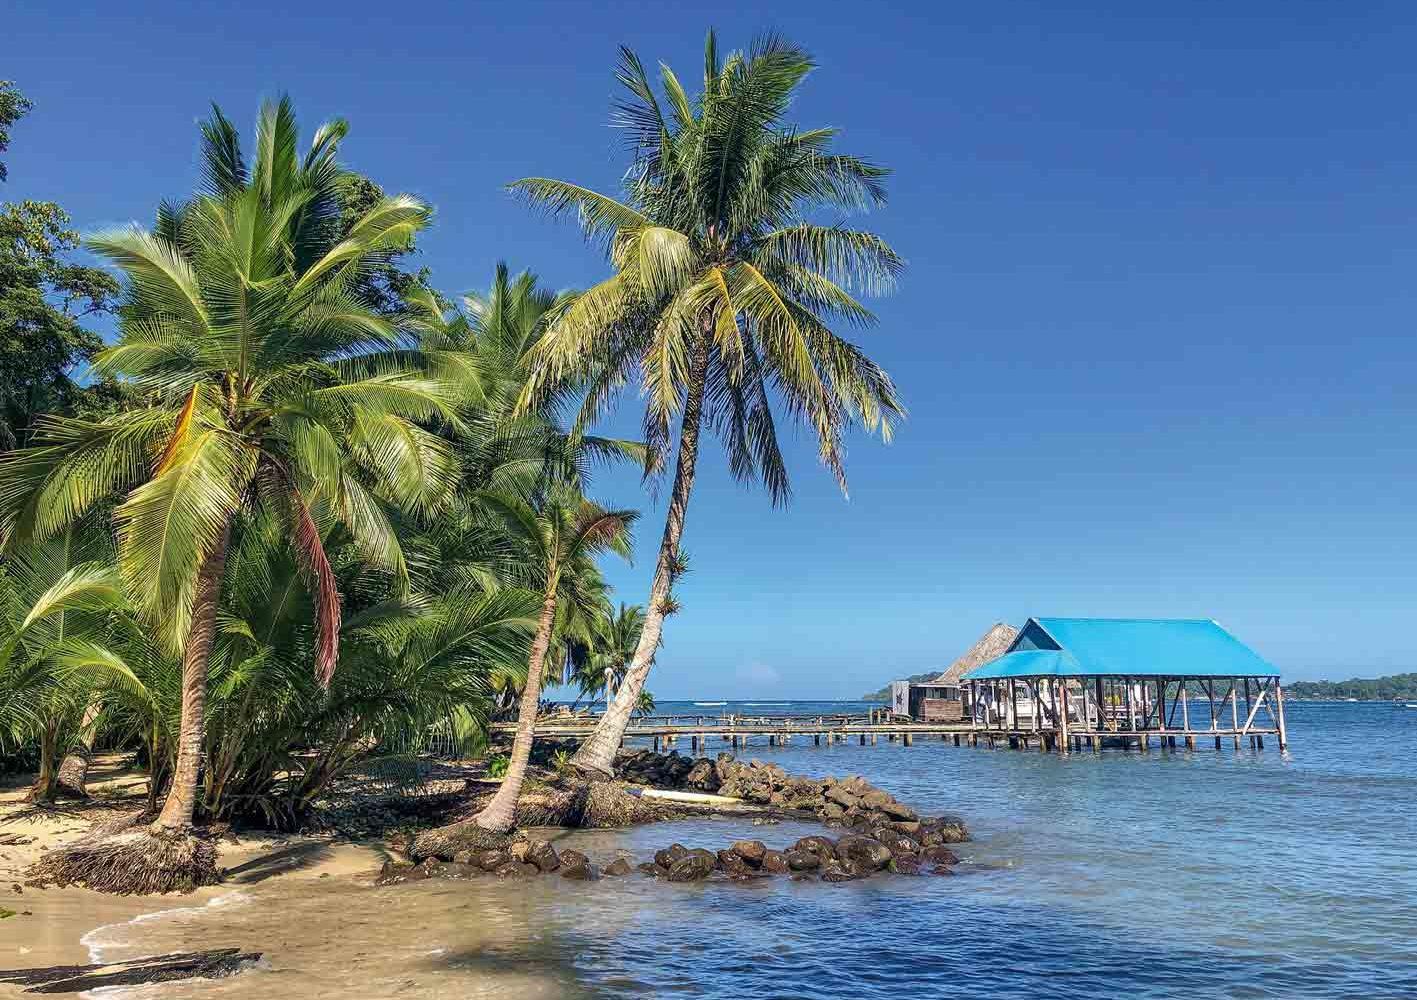 Strand in Bocas del Toro, Panama